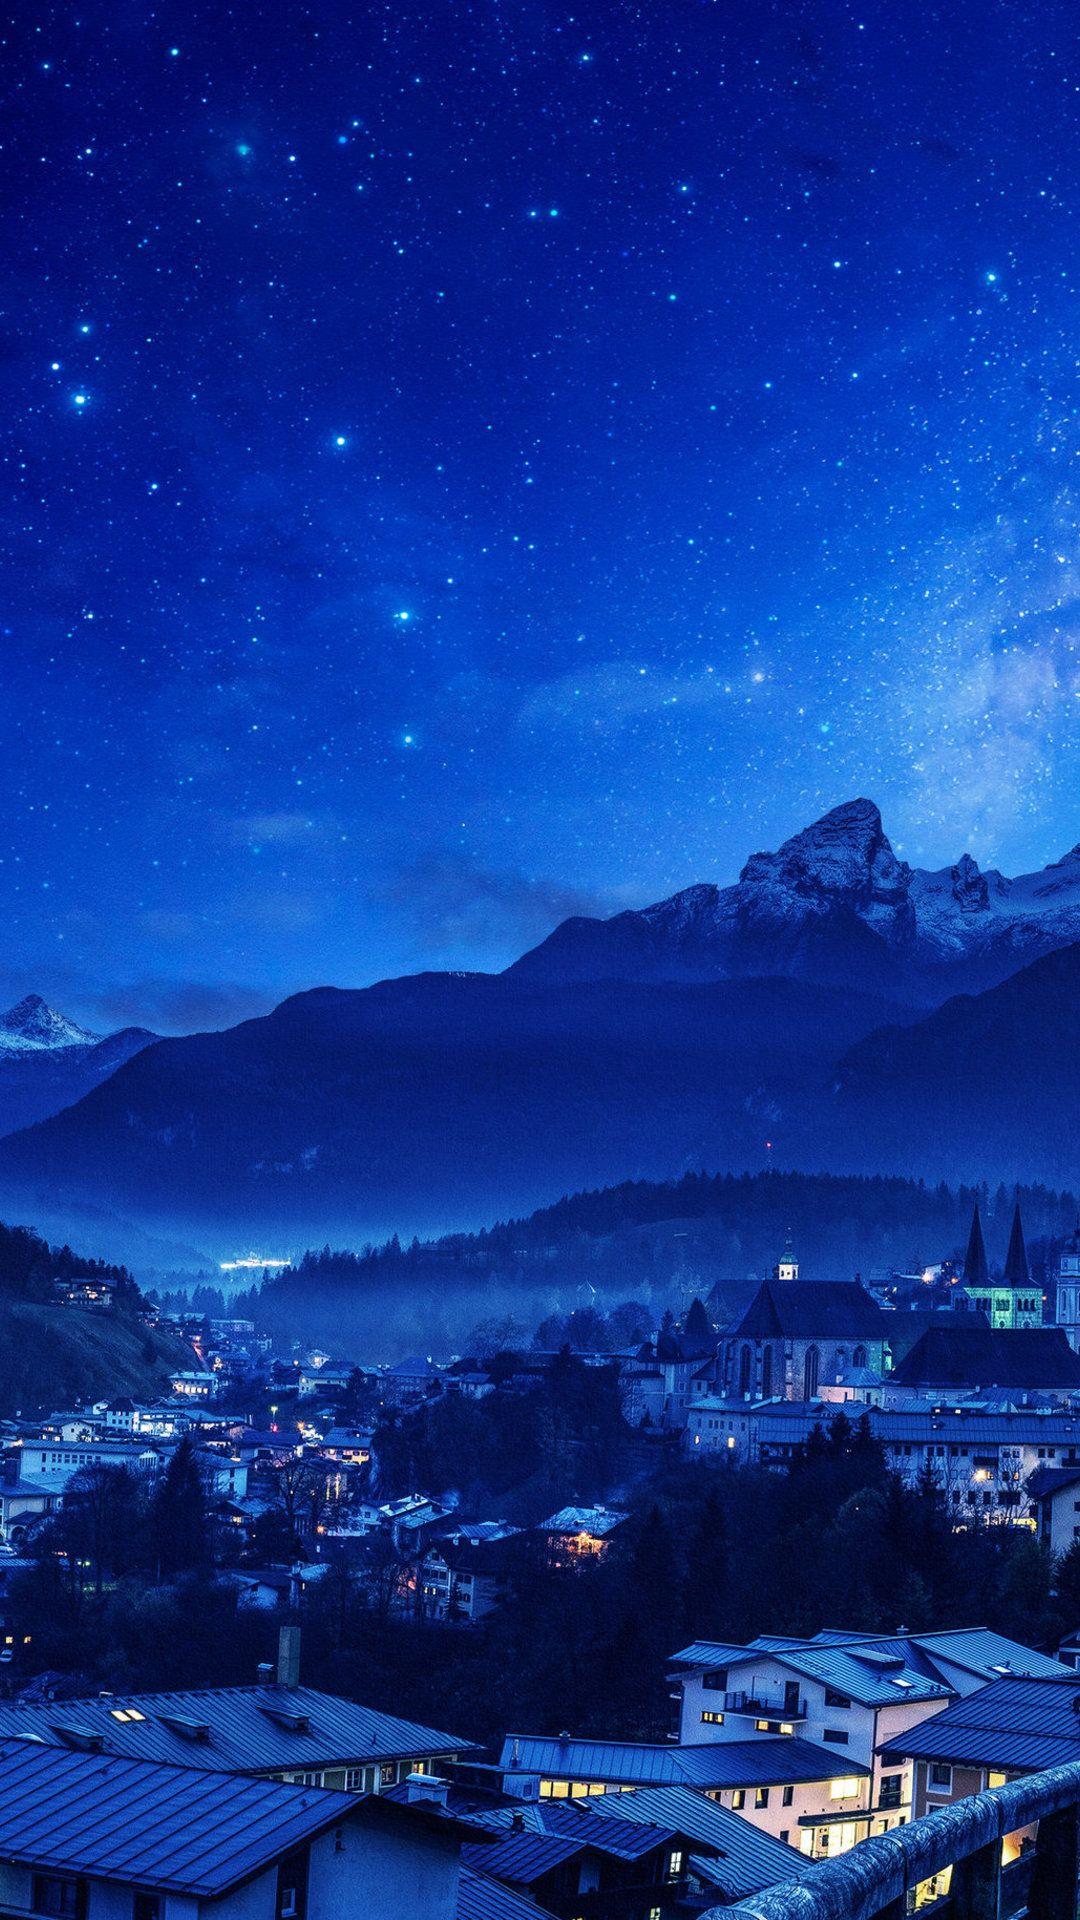 Winter Tale In 1080x1920 Resolution Anime Scenery Wallpaper Scenery Wallpaper Landscape Wallpaper